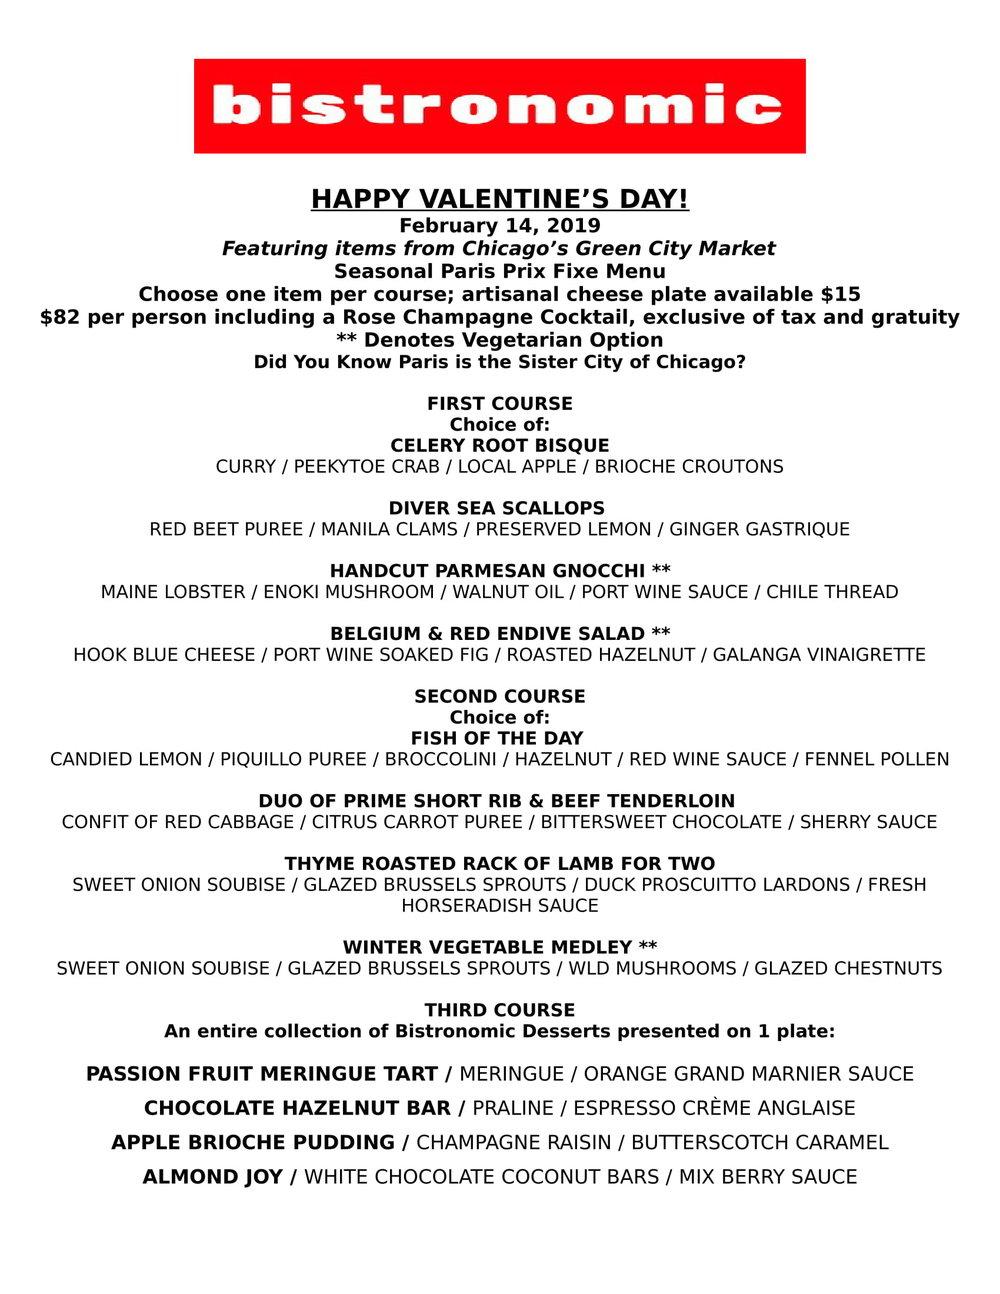 Valentine S Day 2019 Bistronomic